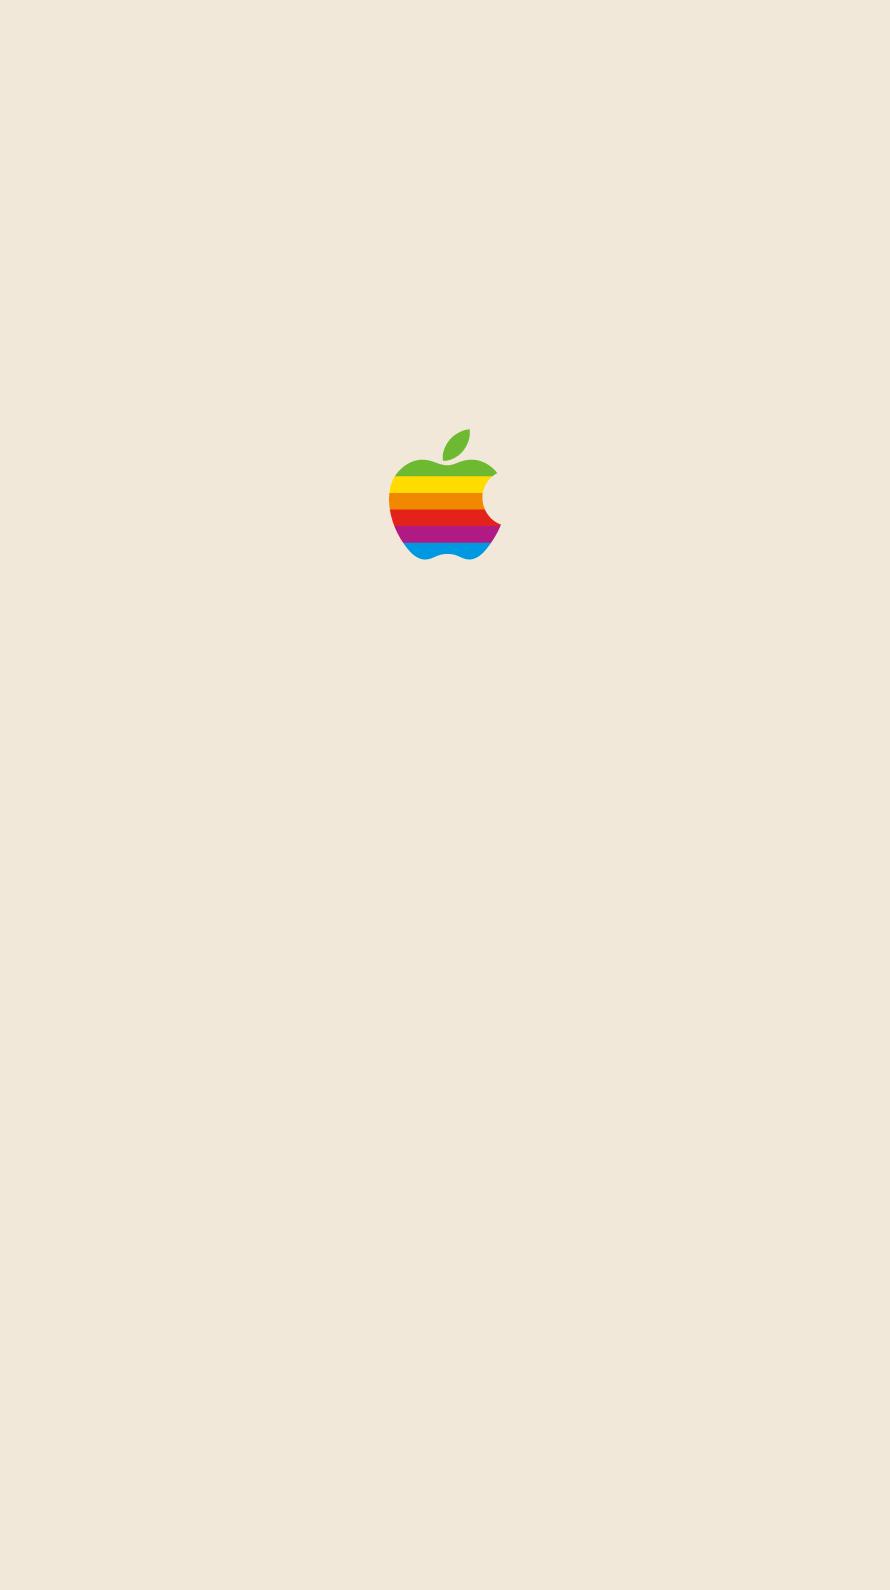 iPhone7, 6, 5用壁紙 Appleレインボーロゴ Yellow